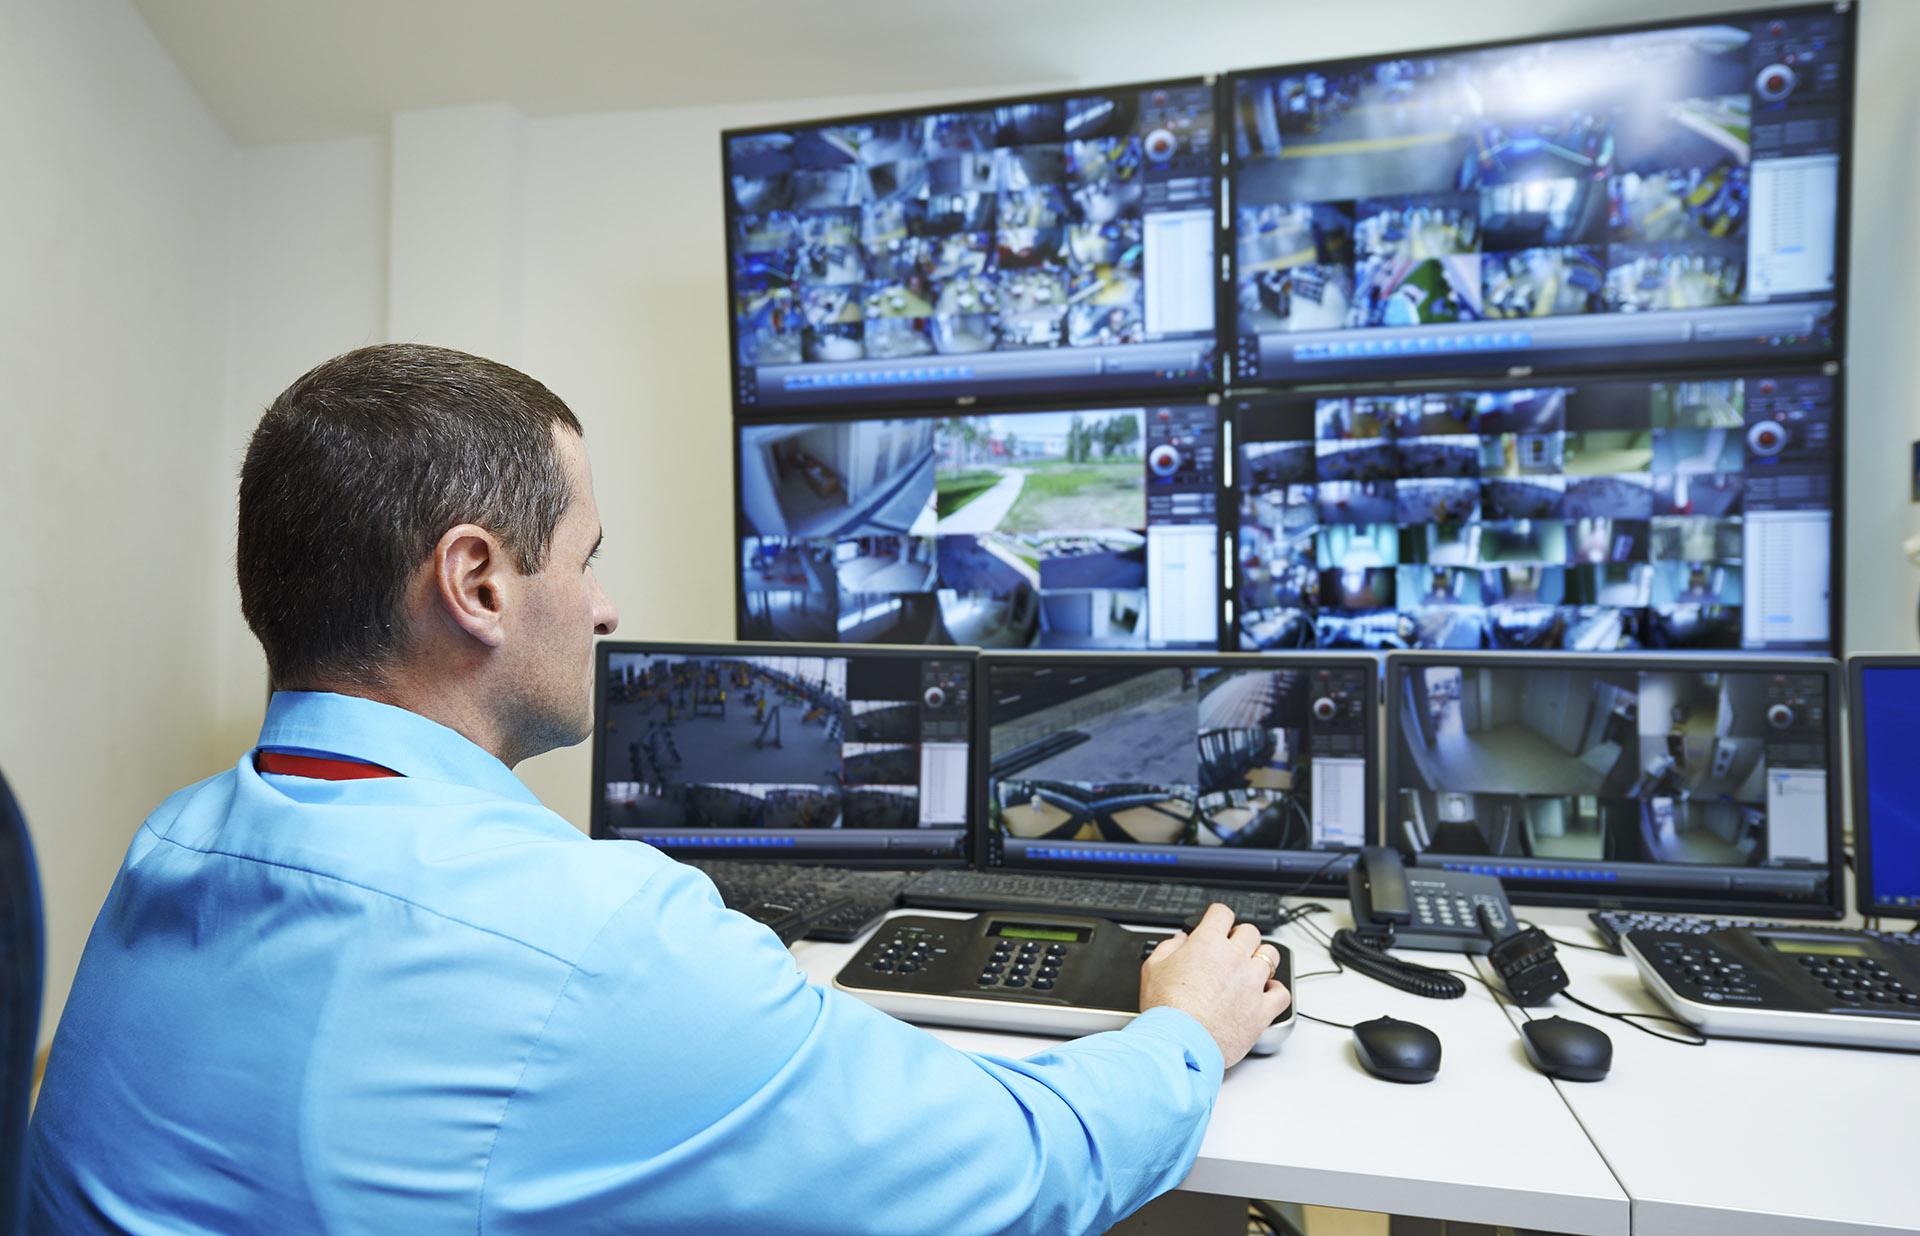 Sistemas de Videovigilancia CCTV monitor